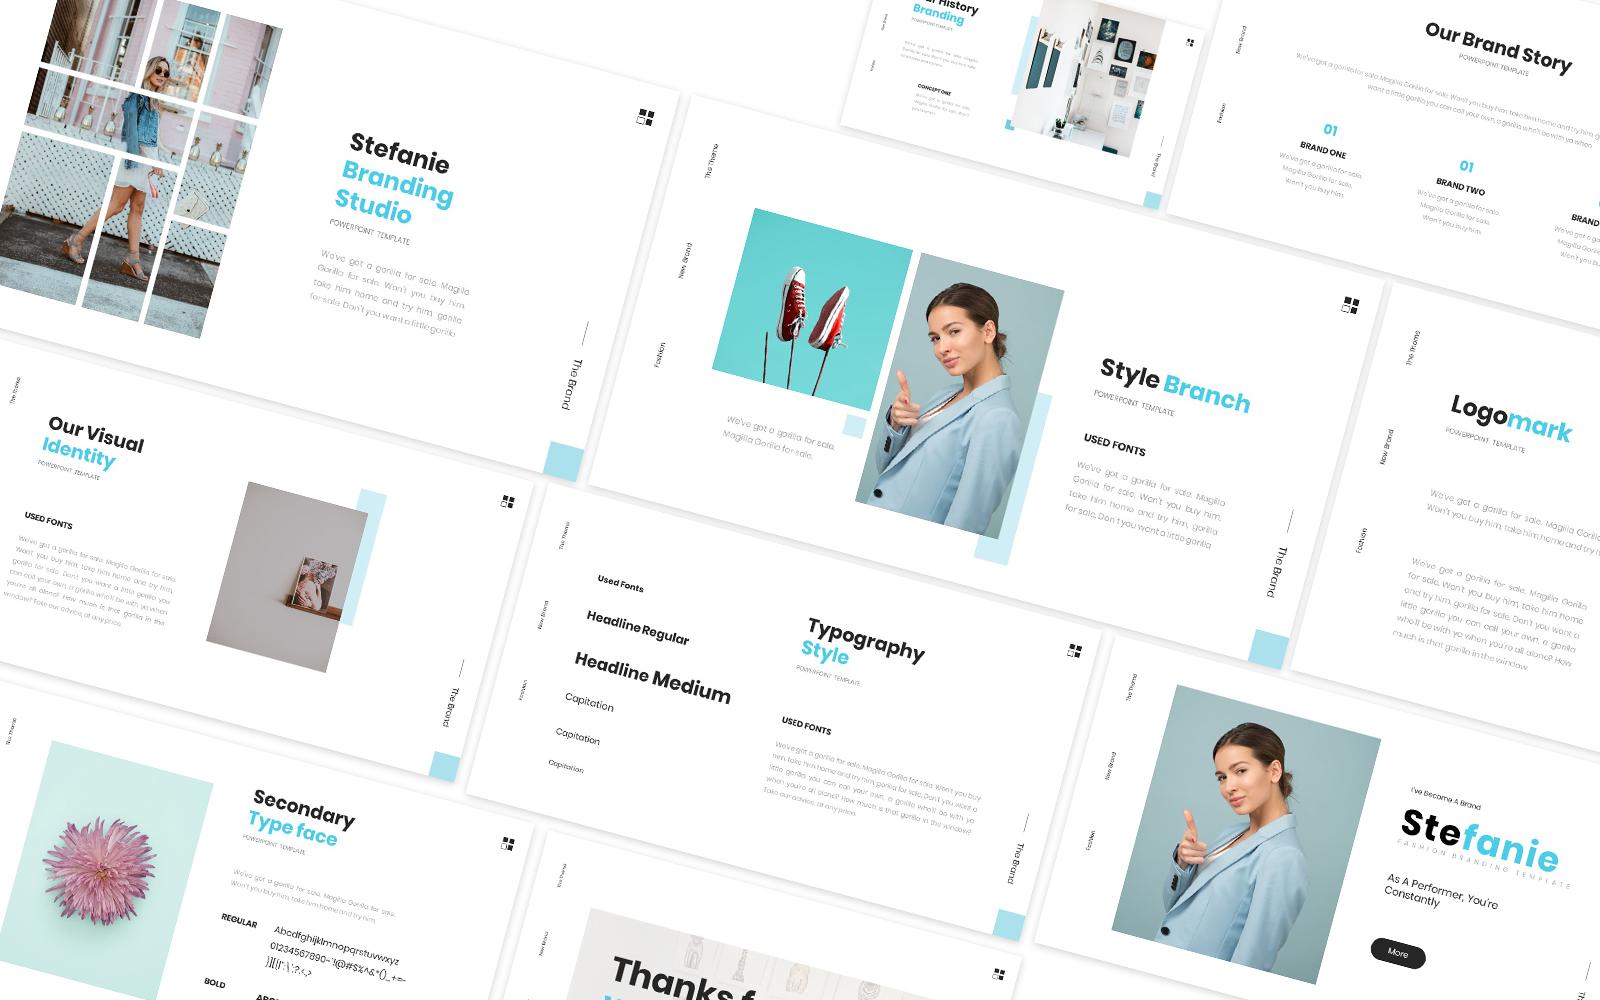 Stefani Branding Powerpoint Template